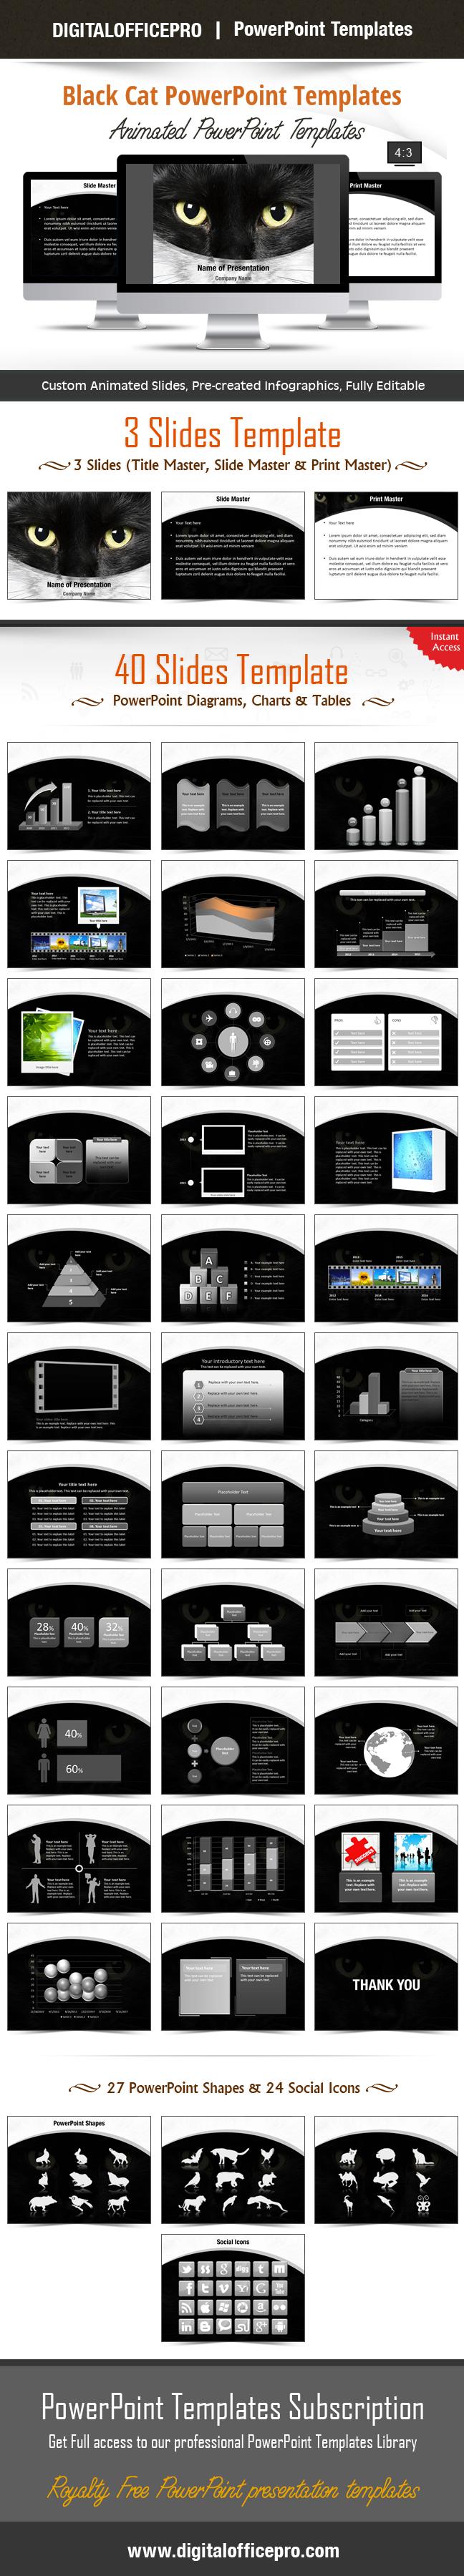 Black cat powerpoint template backgrounds toneelgroepblik Image collections